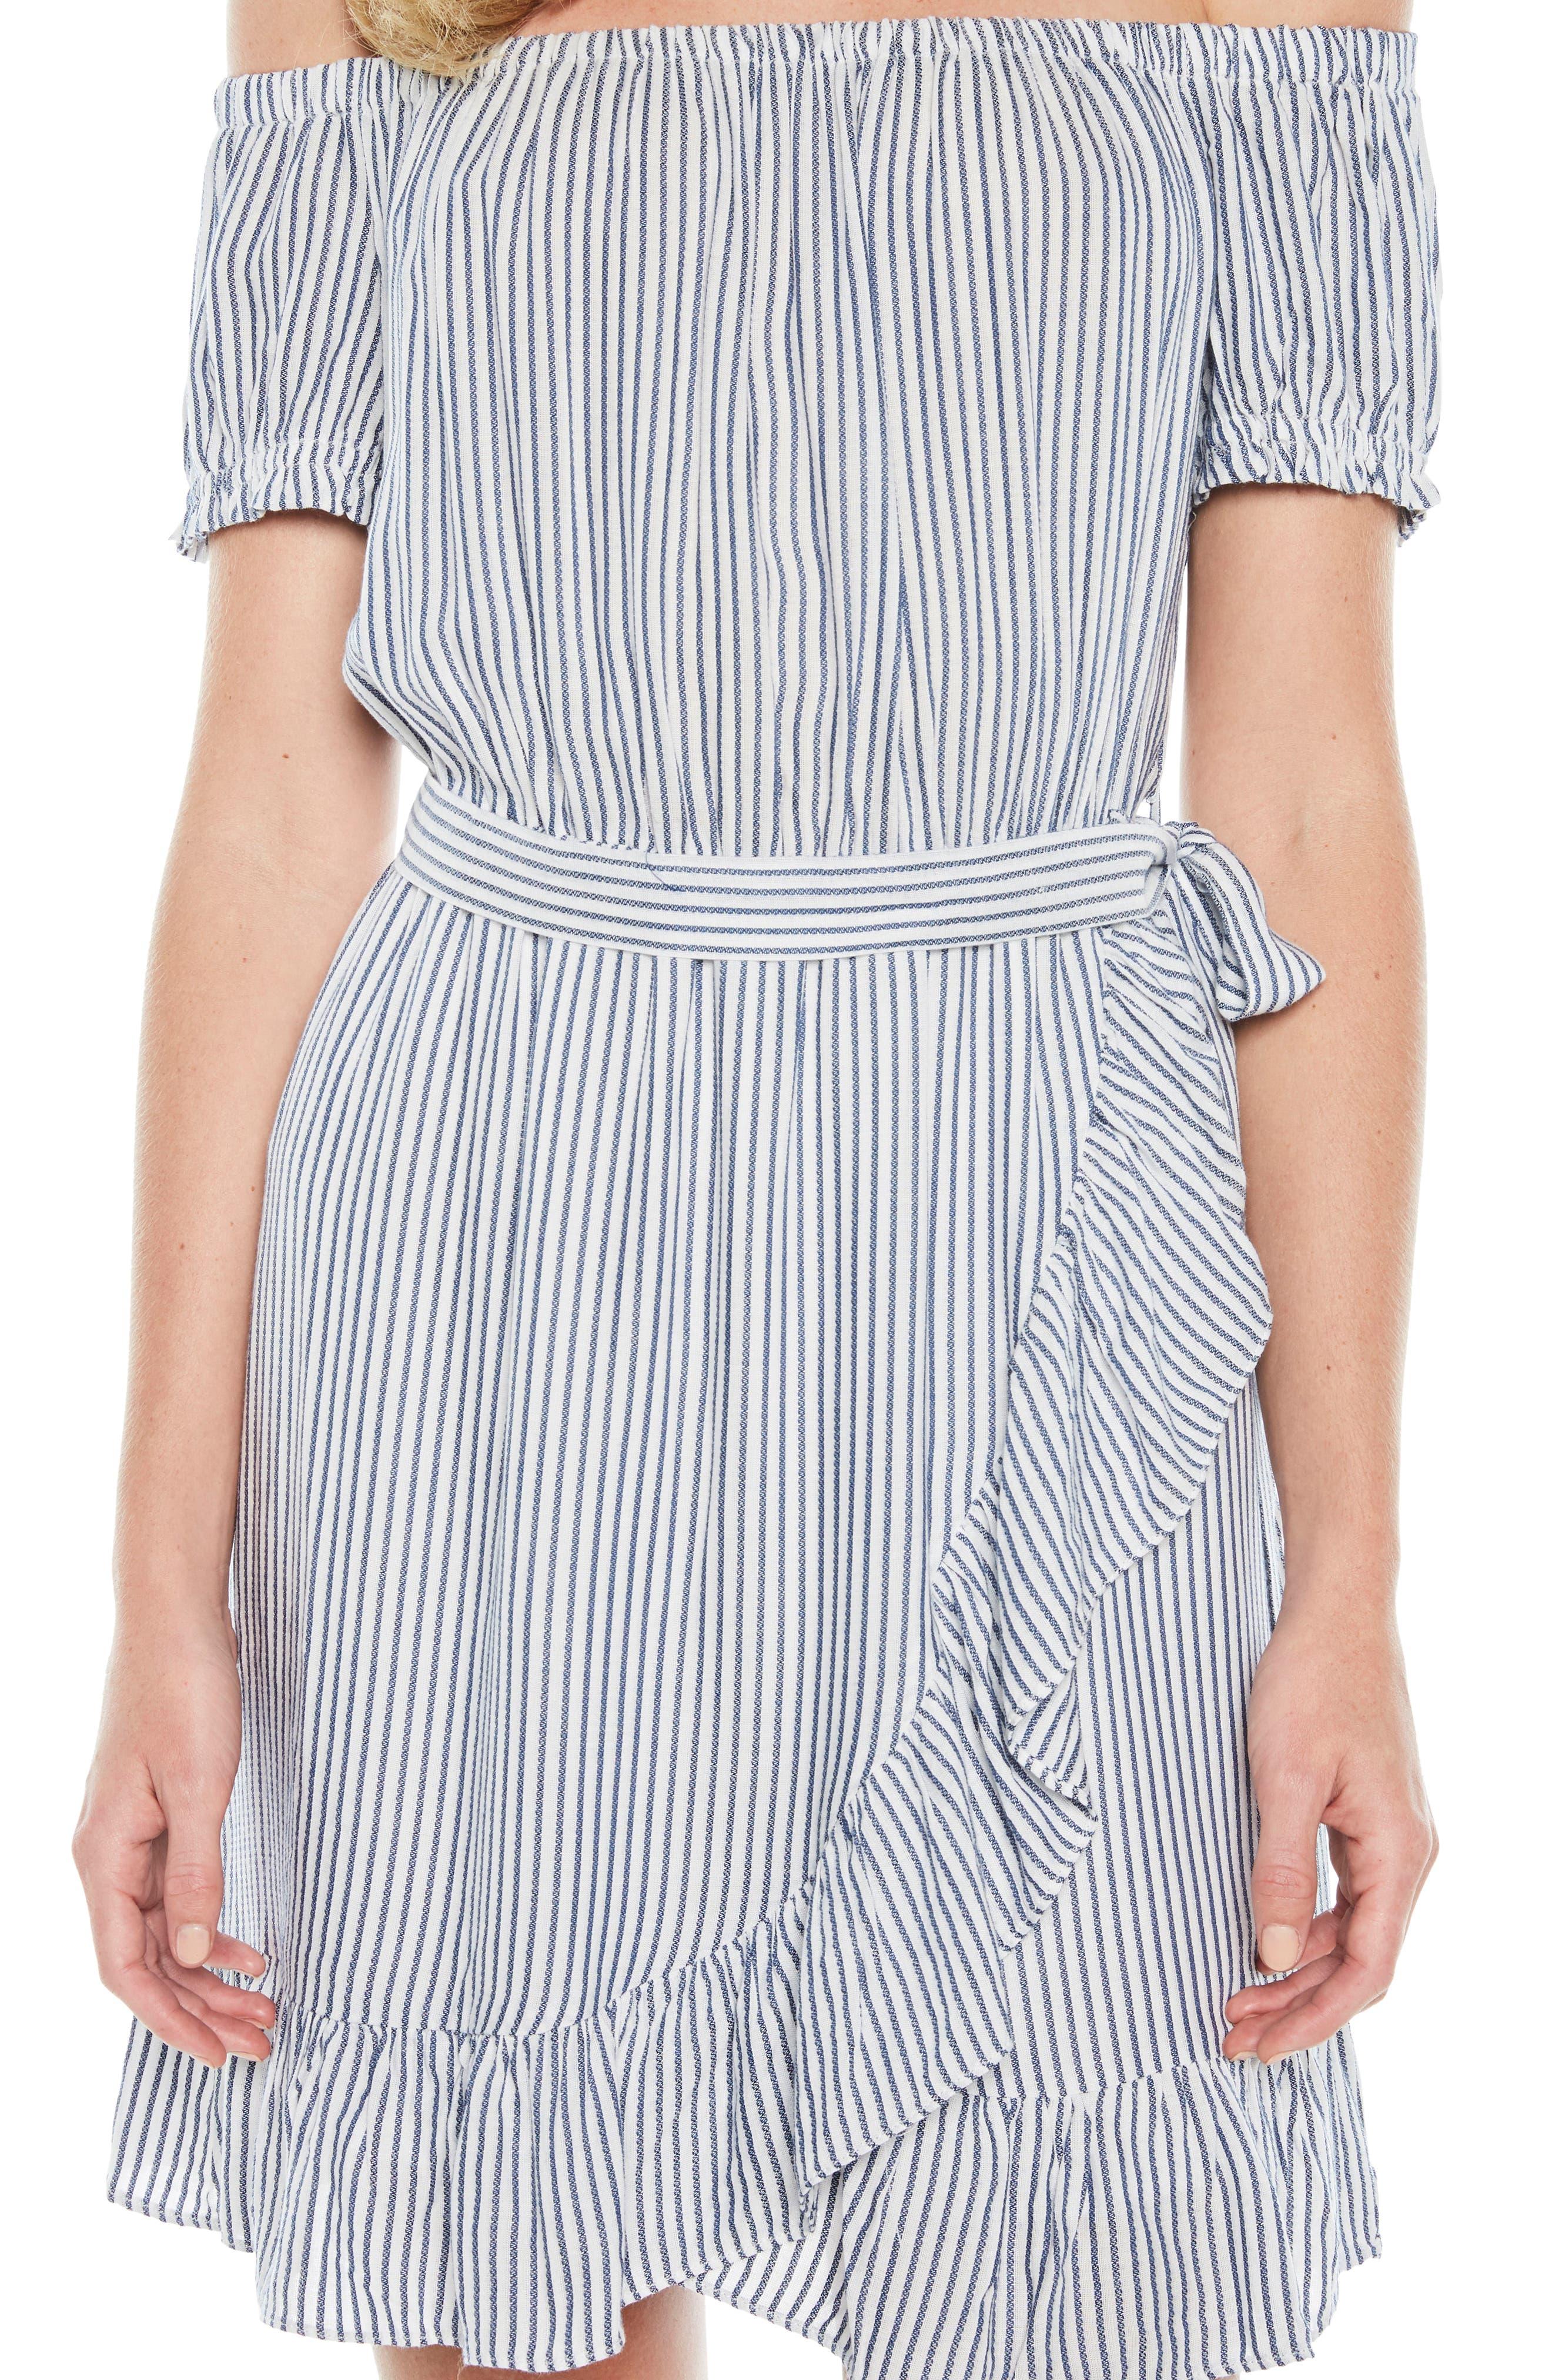 Bobbi Off the Shoulder Stripe Dress,                             Alternate thumbnail 4, color,                             Blue/ White